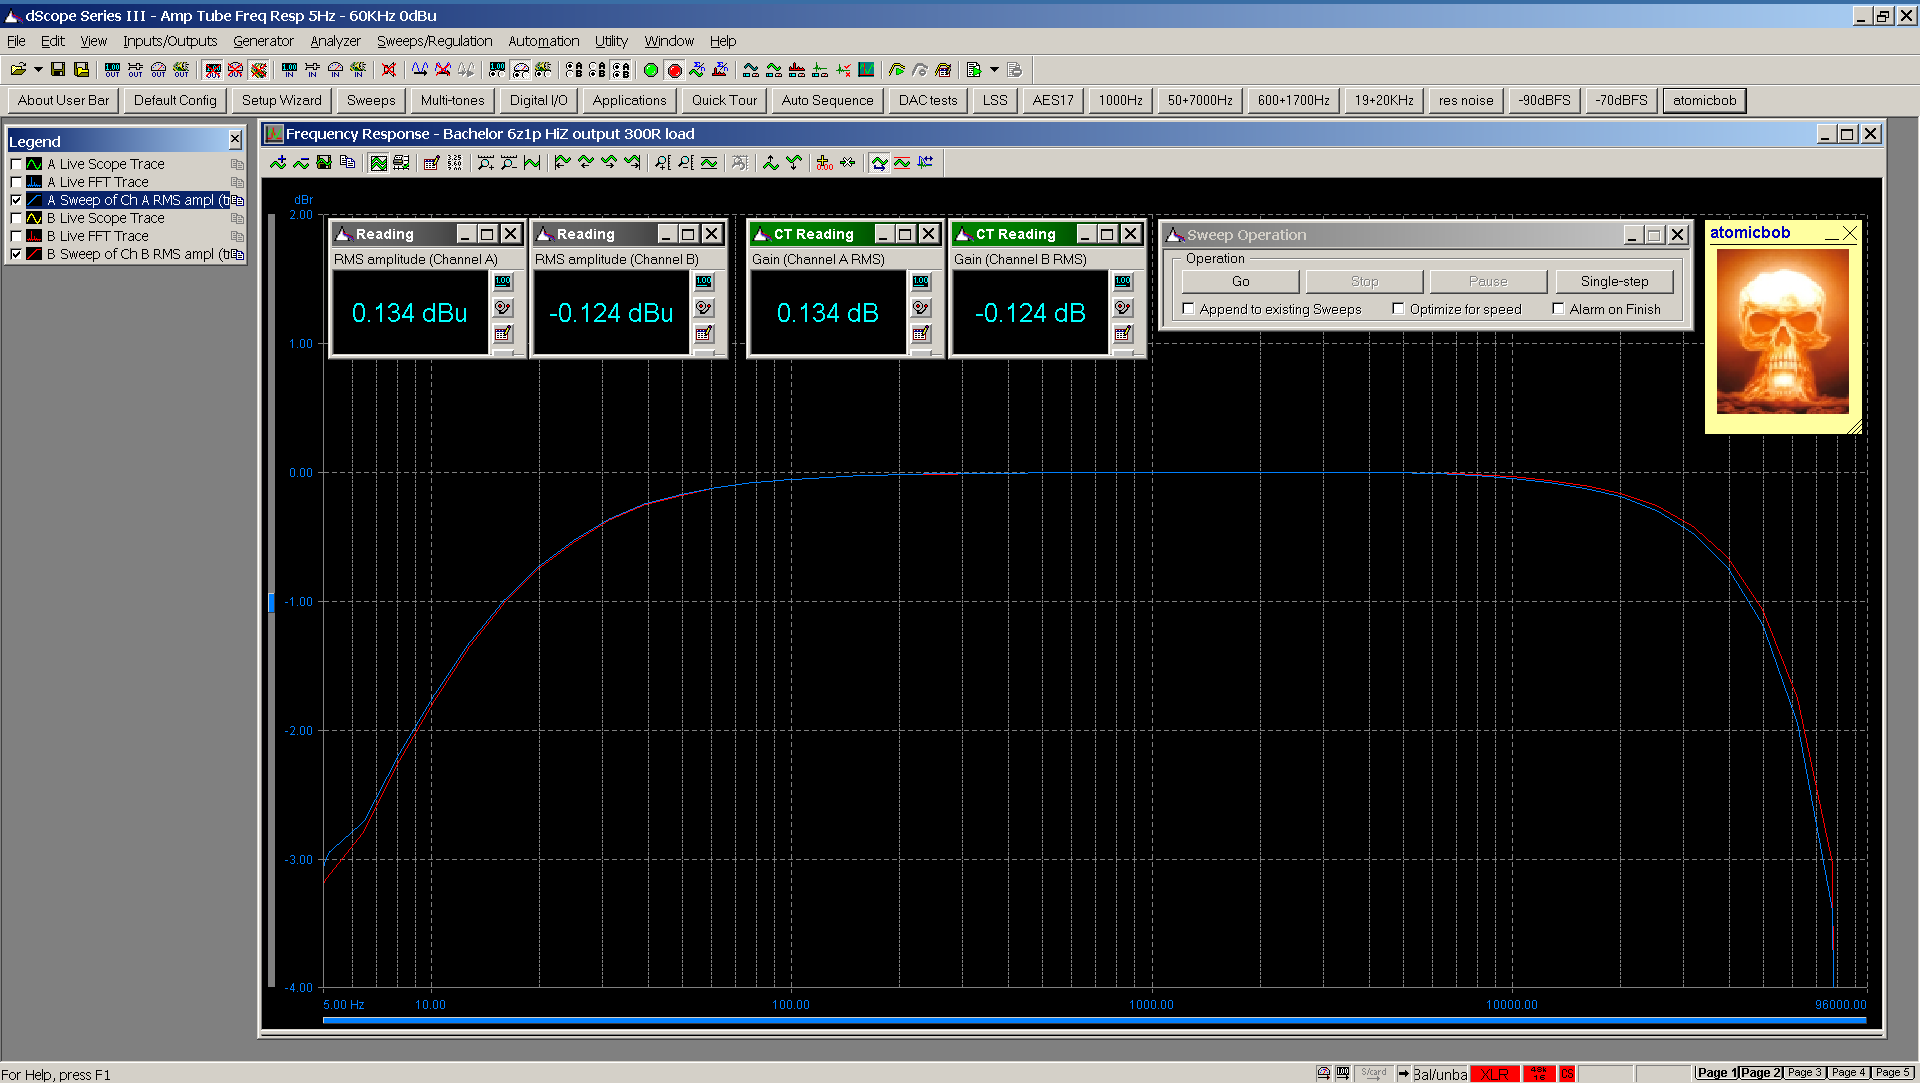 20200619 Bachelor 6z1p frequency response 5Hz - 96KHz 300R 0dBu.png